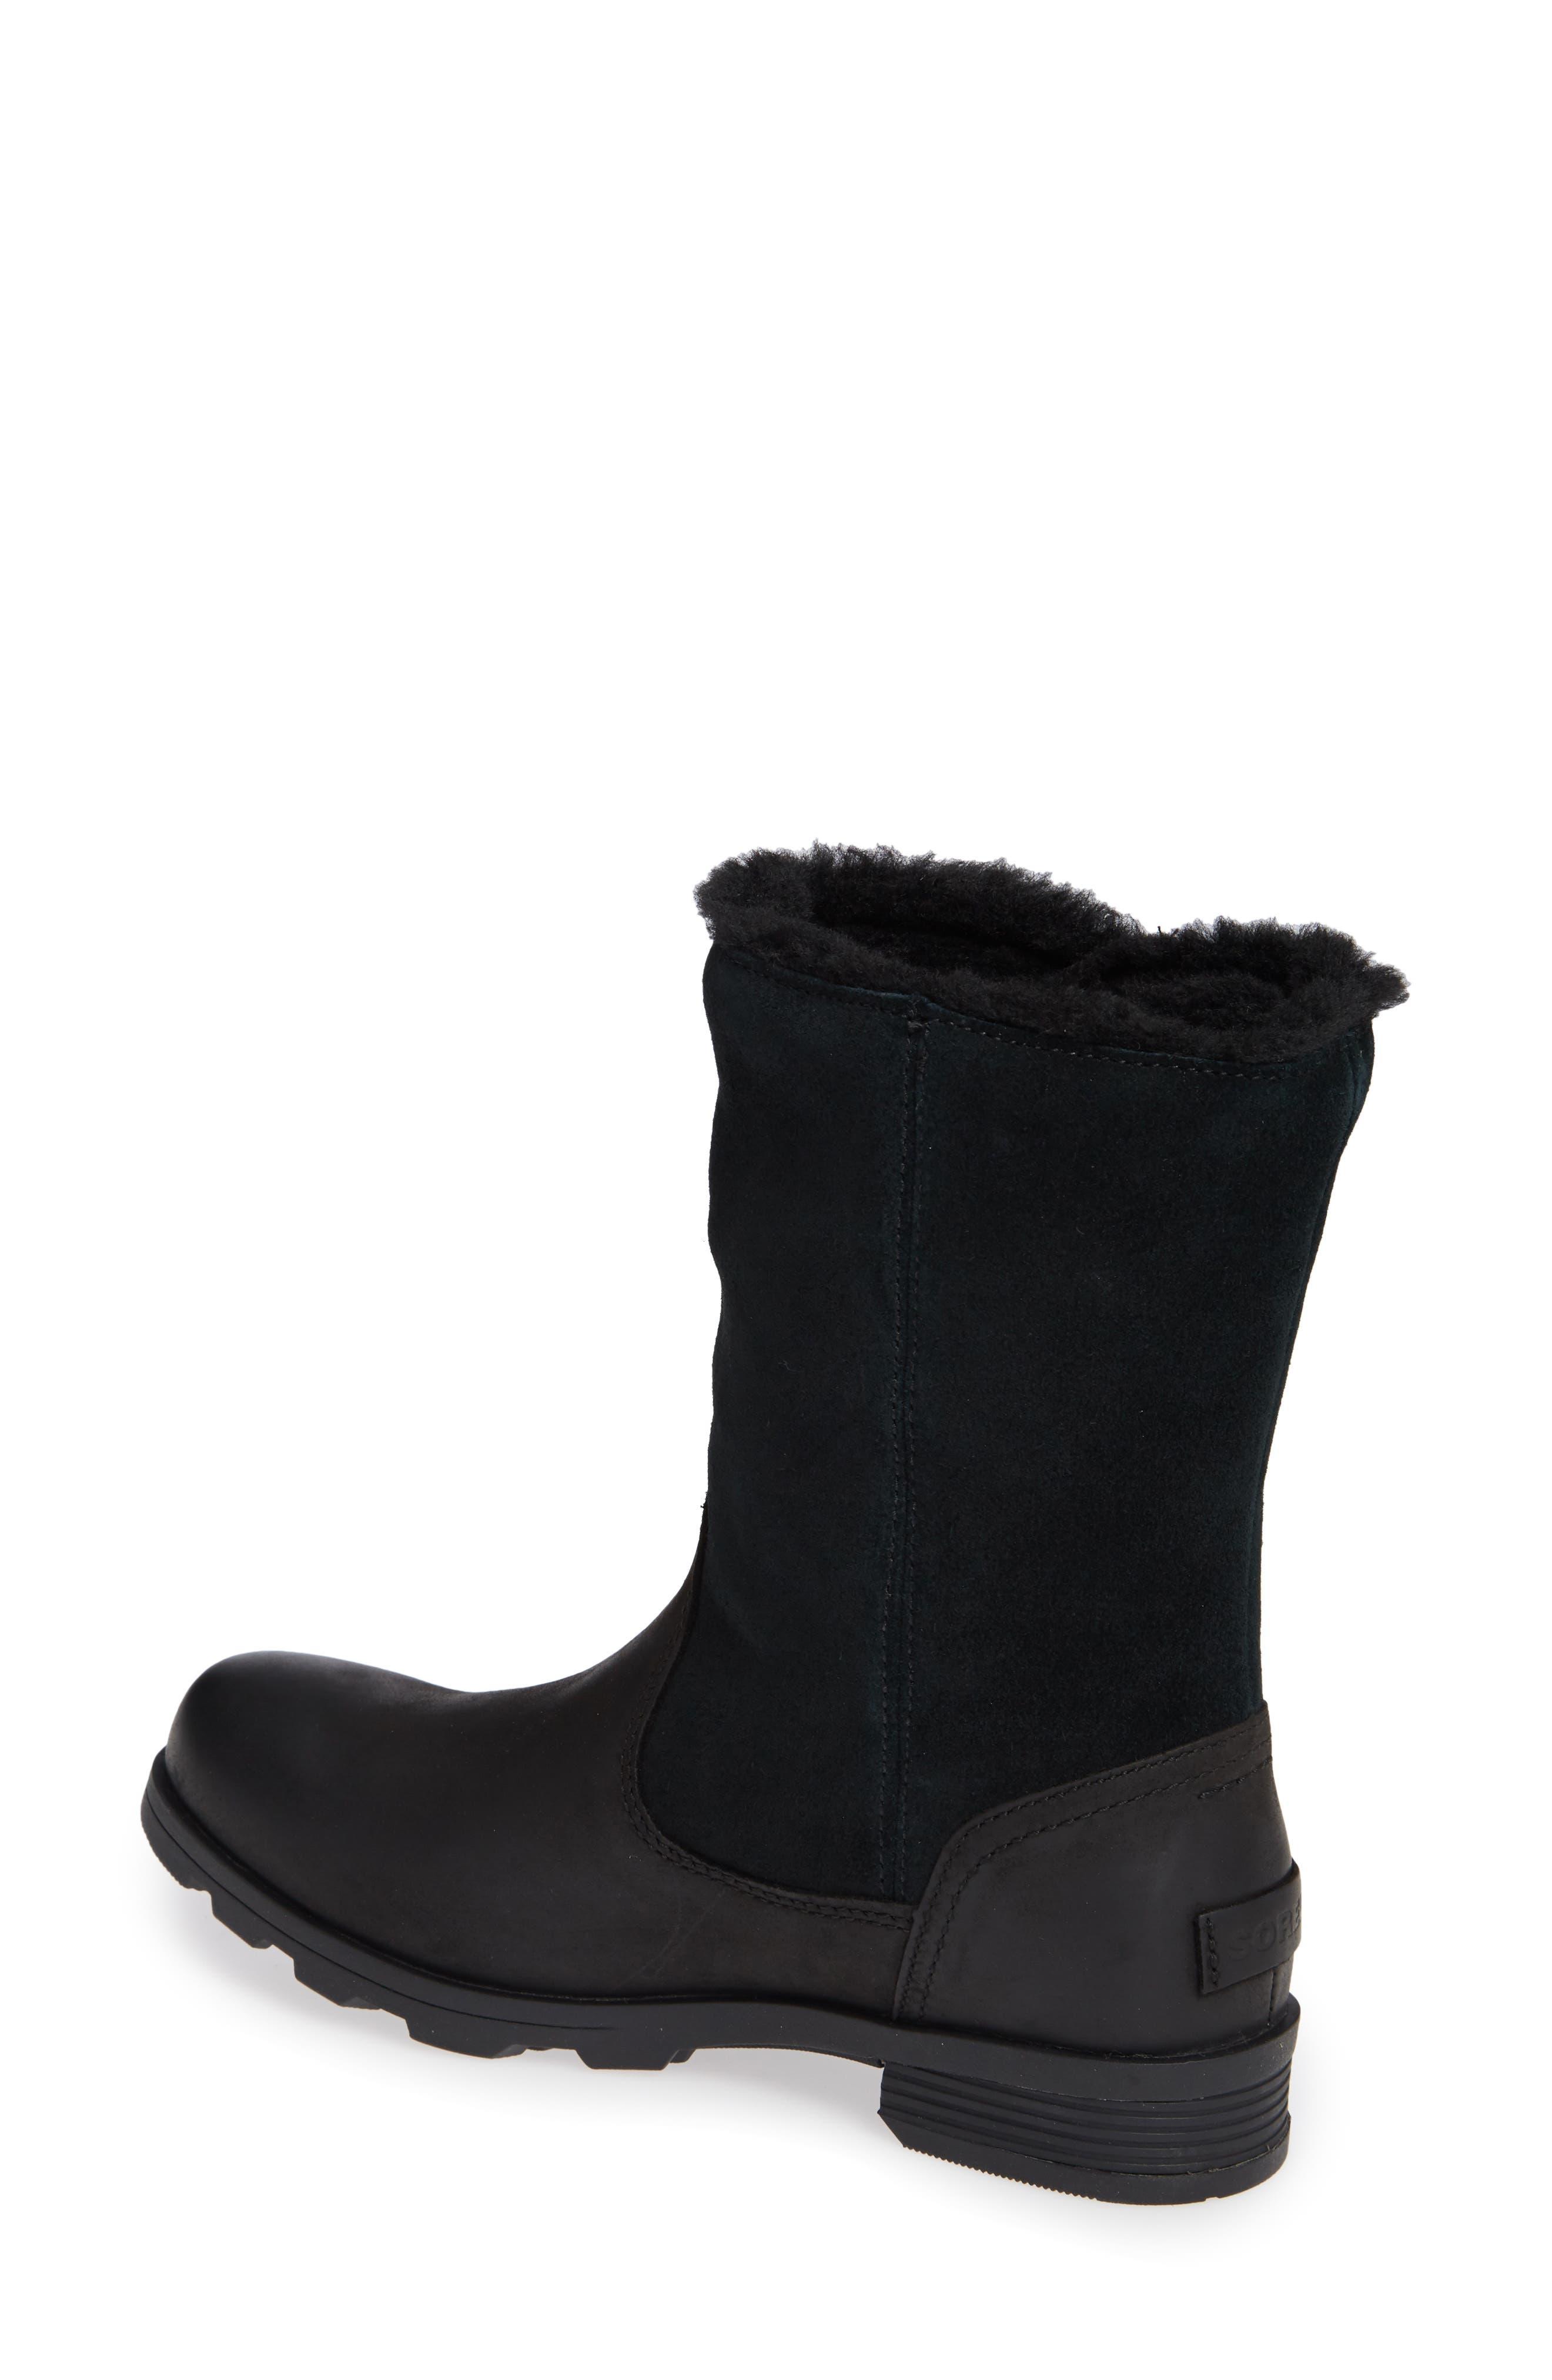 Emelie Waterproof Faux Fur Lined Boot,                             Alternate thumbnail 2, color,                             BLACK